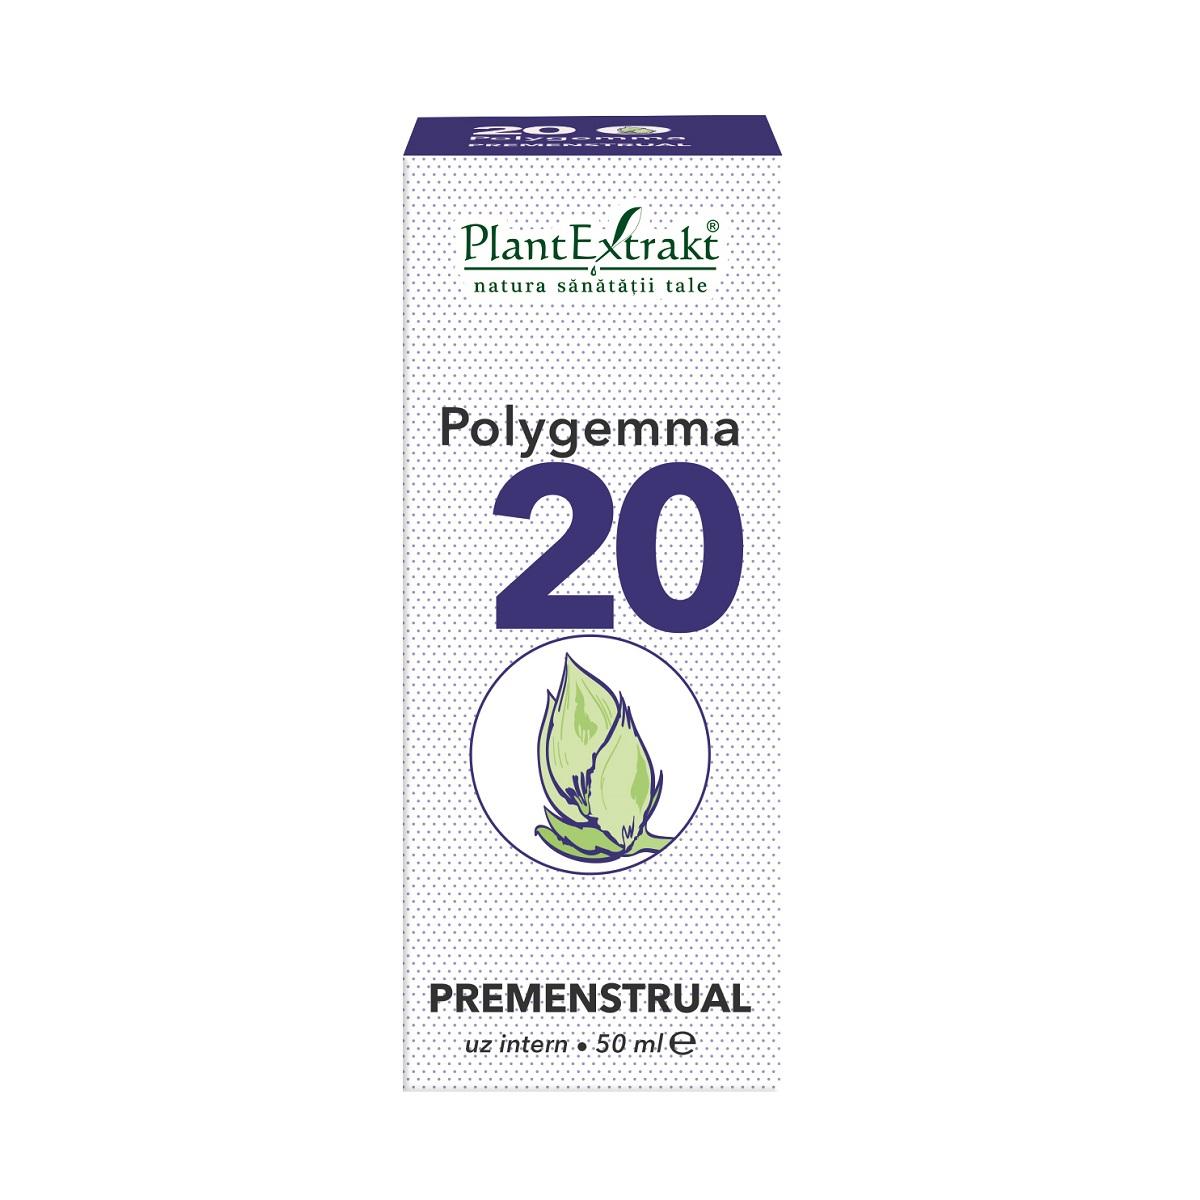 Polygemma 20 Premenstrual, 50ml, Plant Extrakt drmax poza